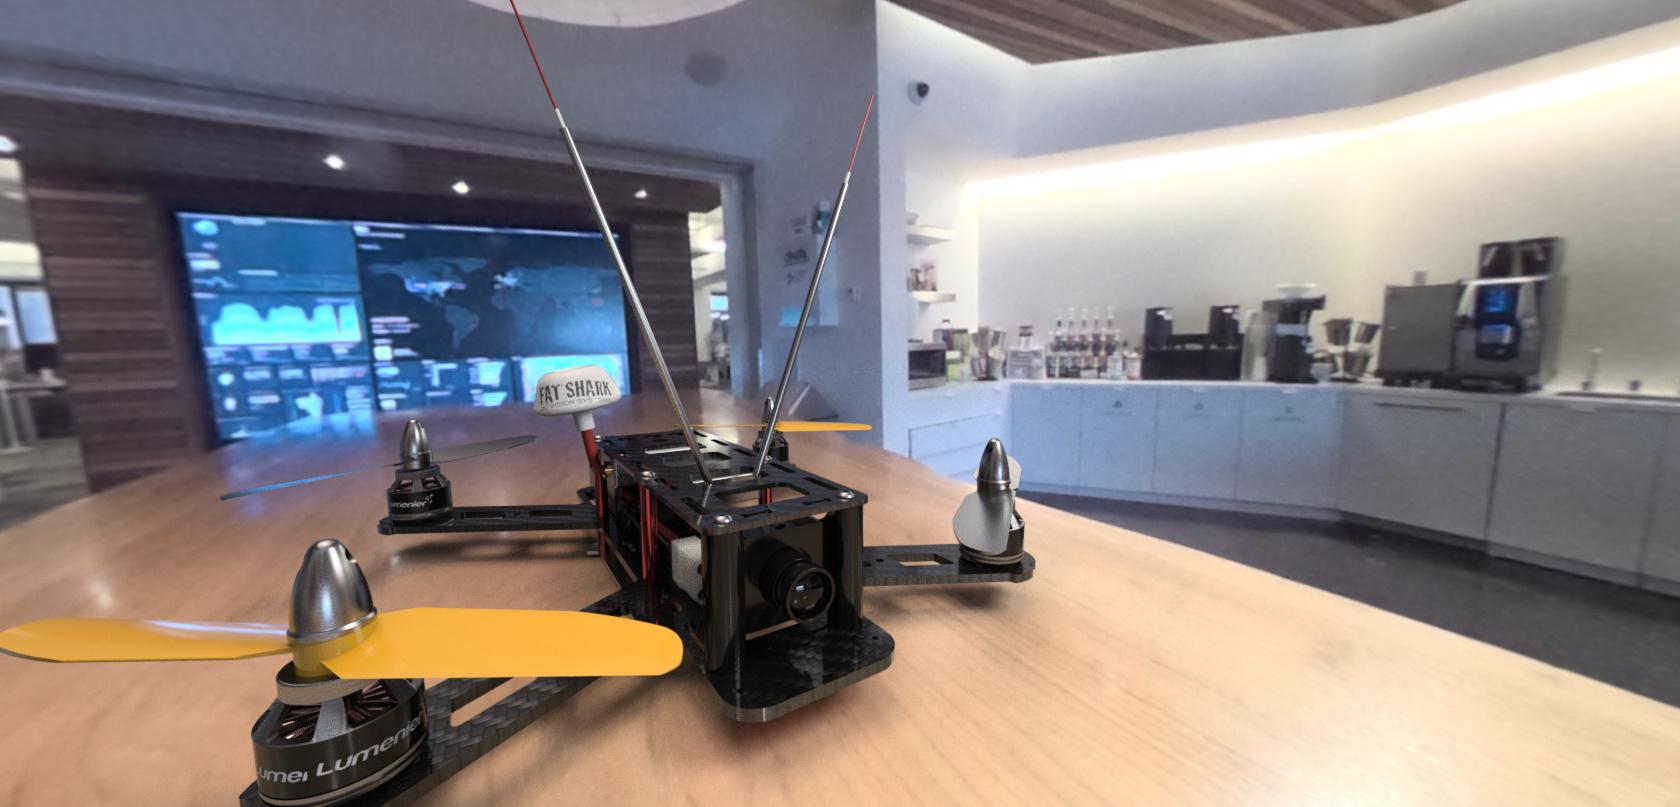 Cutom IBL lighting & Cutom IBL lighting|Autodesk Online Gallery azcodes.com